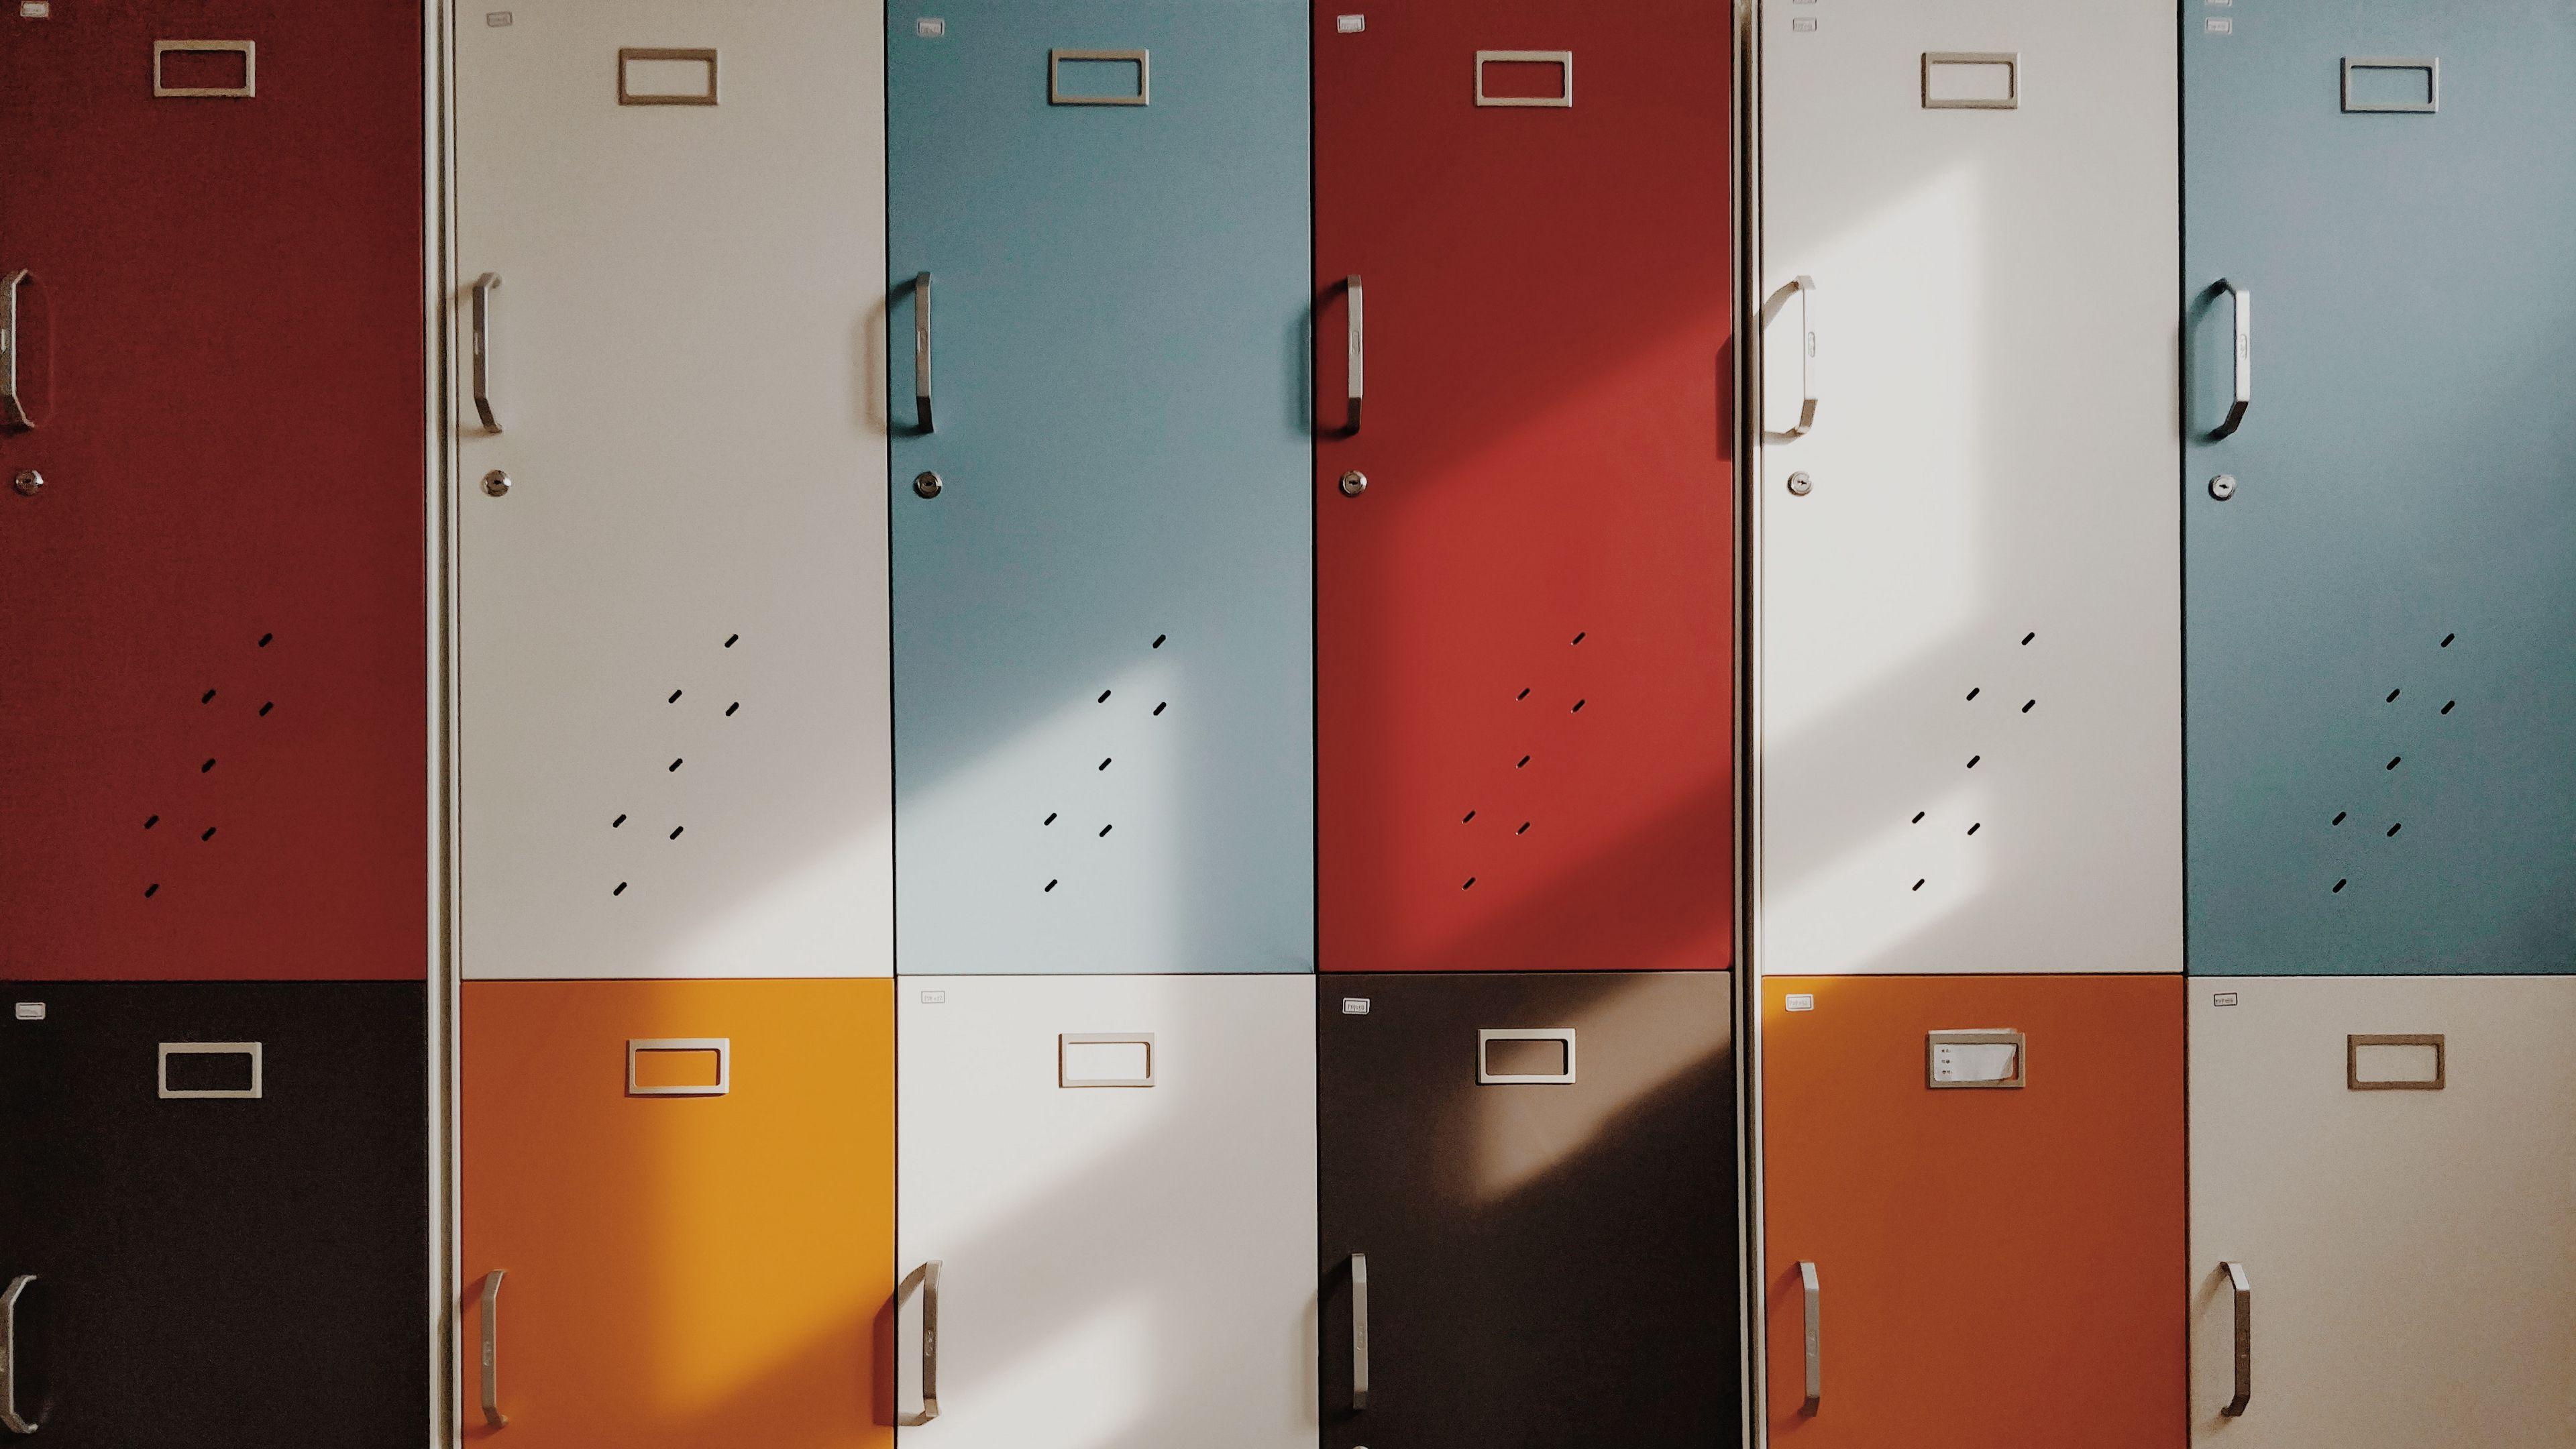 3840x2160 Wallpaper doors, lockers, retro, multicolored